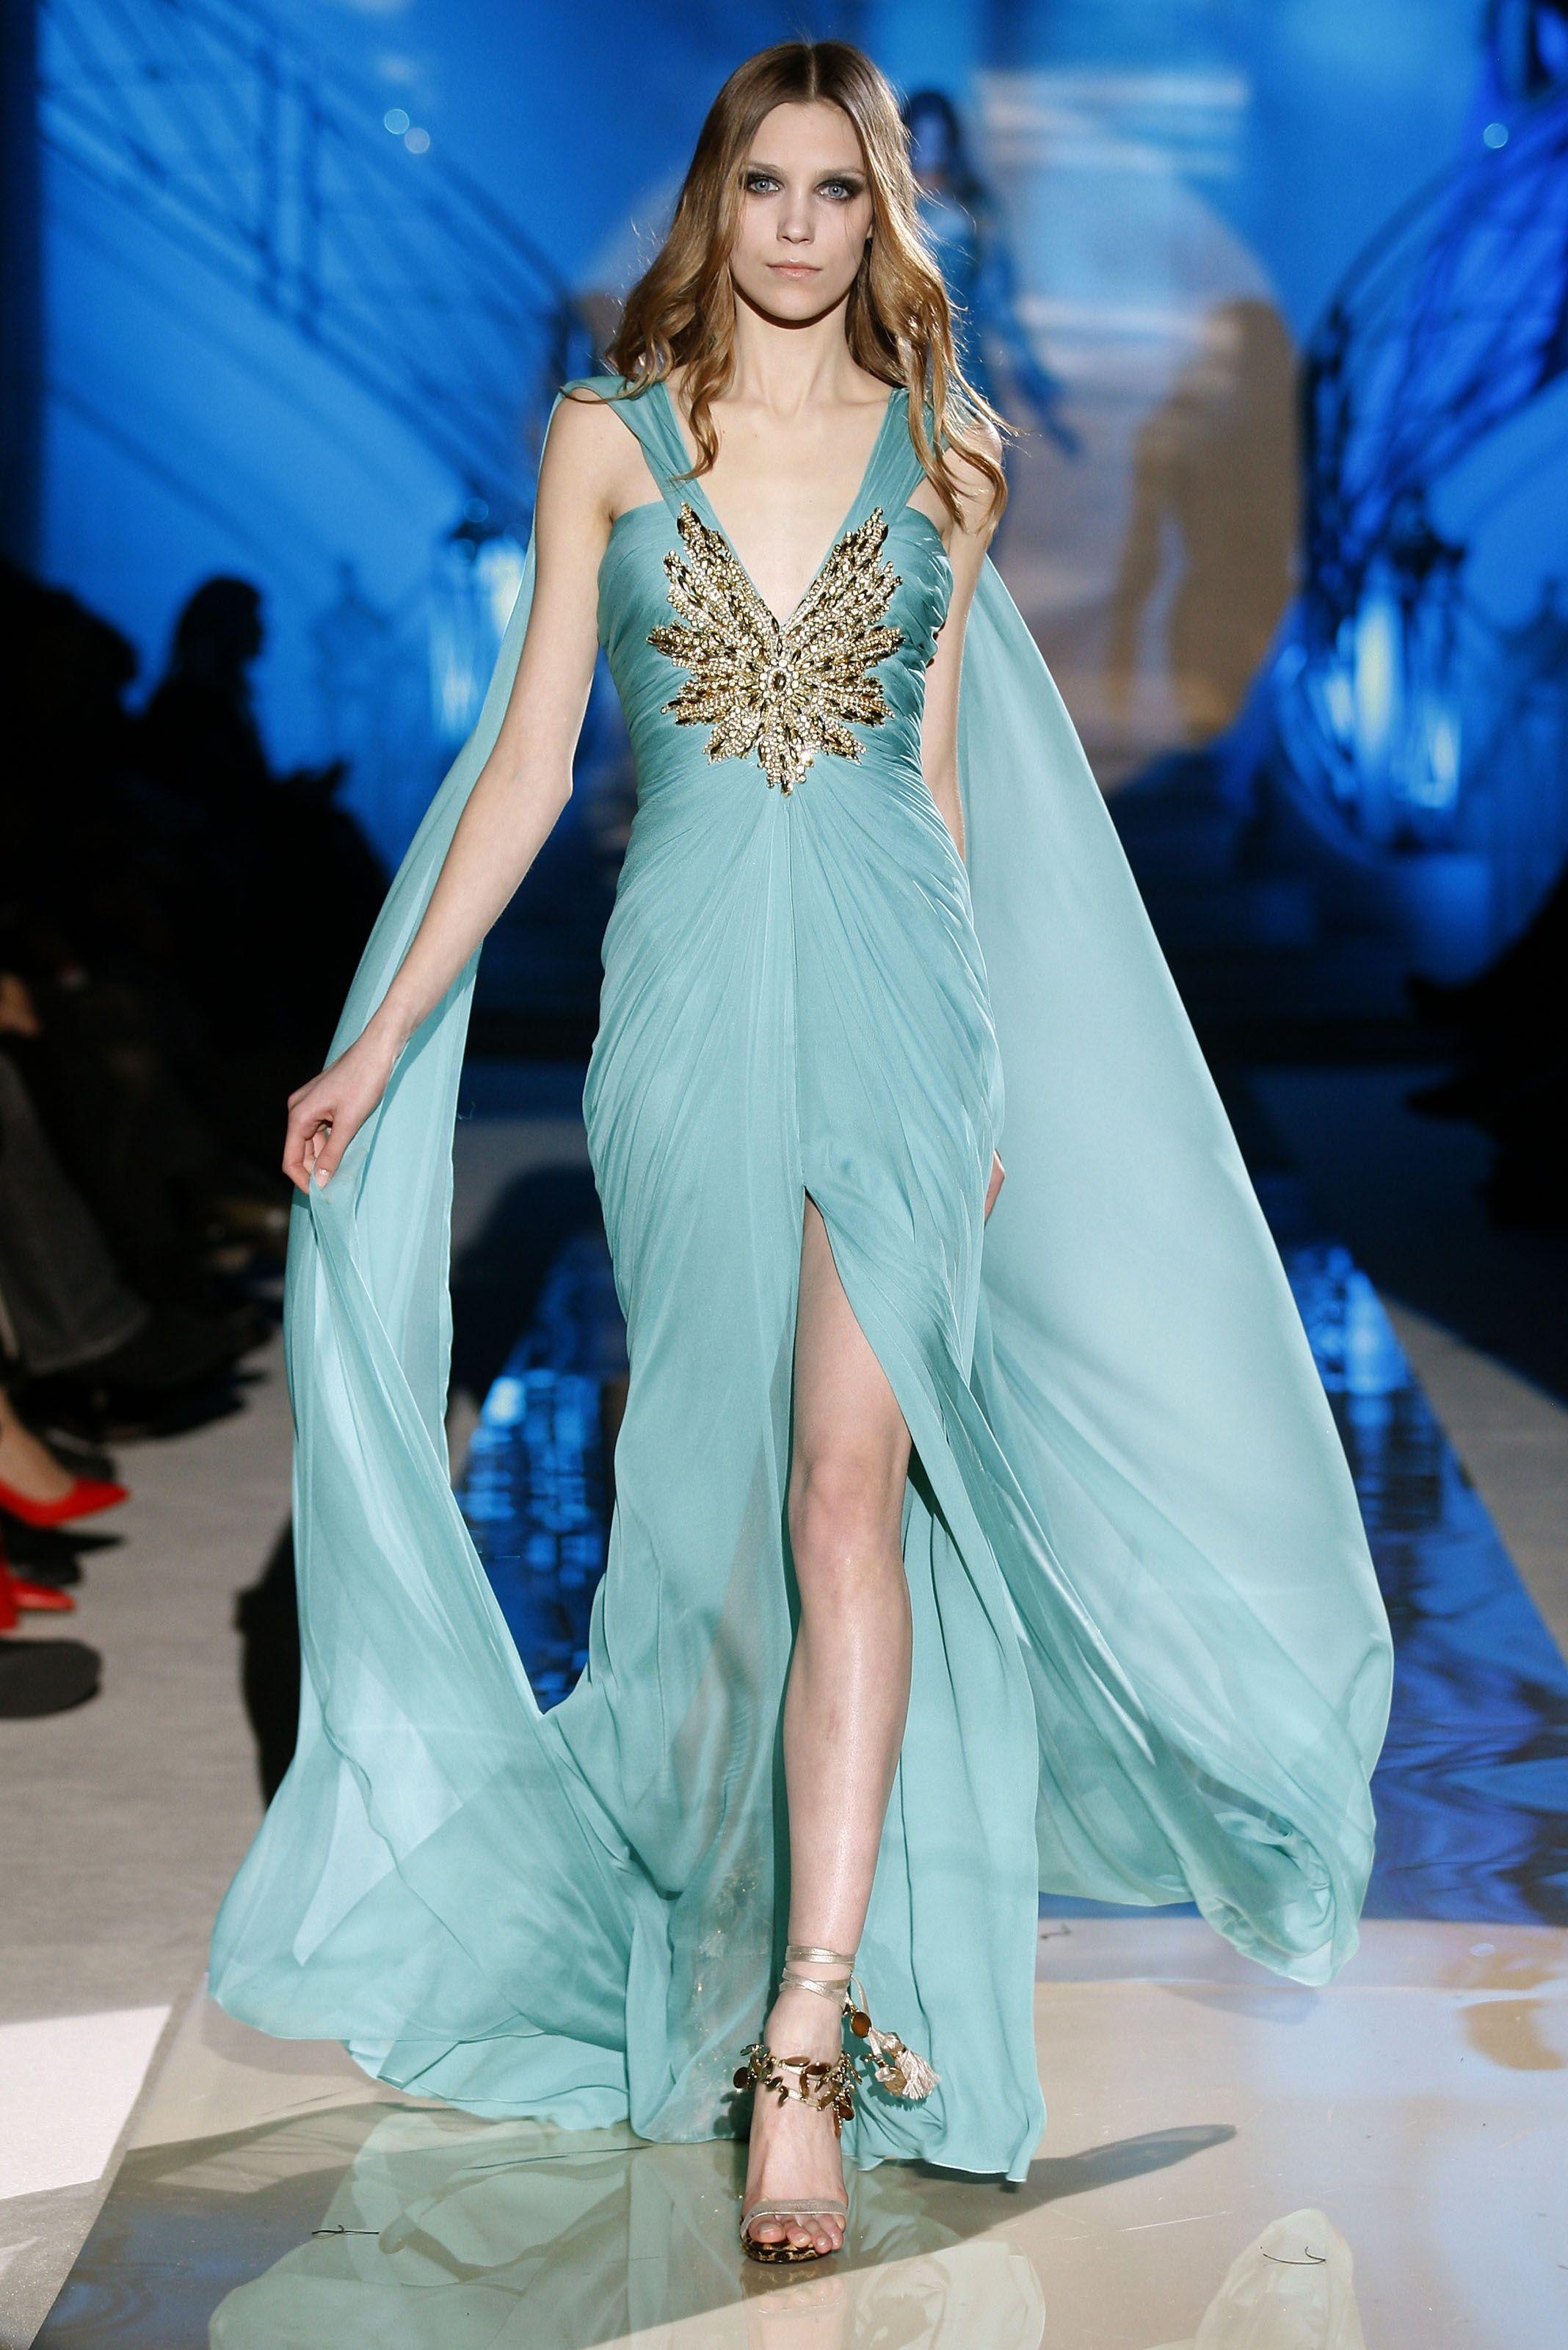 Designs in Baby Blue #DesignsinBabyBlue #BabyBlue #Fashion #HauteCouture #BabyBlueFabrics #BabyBlueDresses #BabyBlueFashion #RexFabrics #Couture #CoutureFabrics #FashionFabrics #AzulClaro #Azul #Telas #VestidosenAzul #AltaModa #Tecidos #AltaCotura #Tejidos #Textiles #BabyBlueGowns #Gowns #Blue #Chic #Elegance #Glamorous